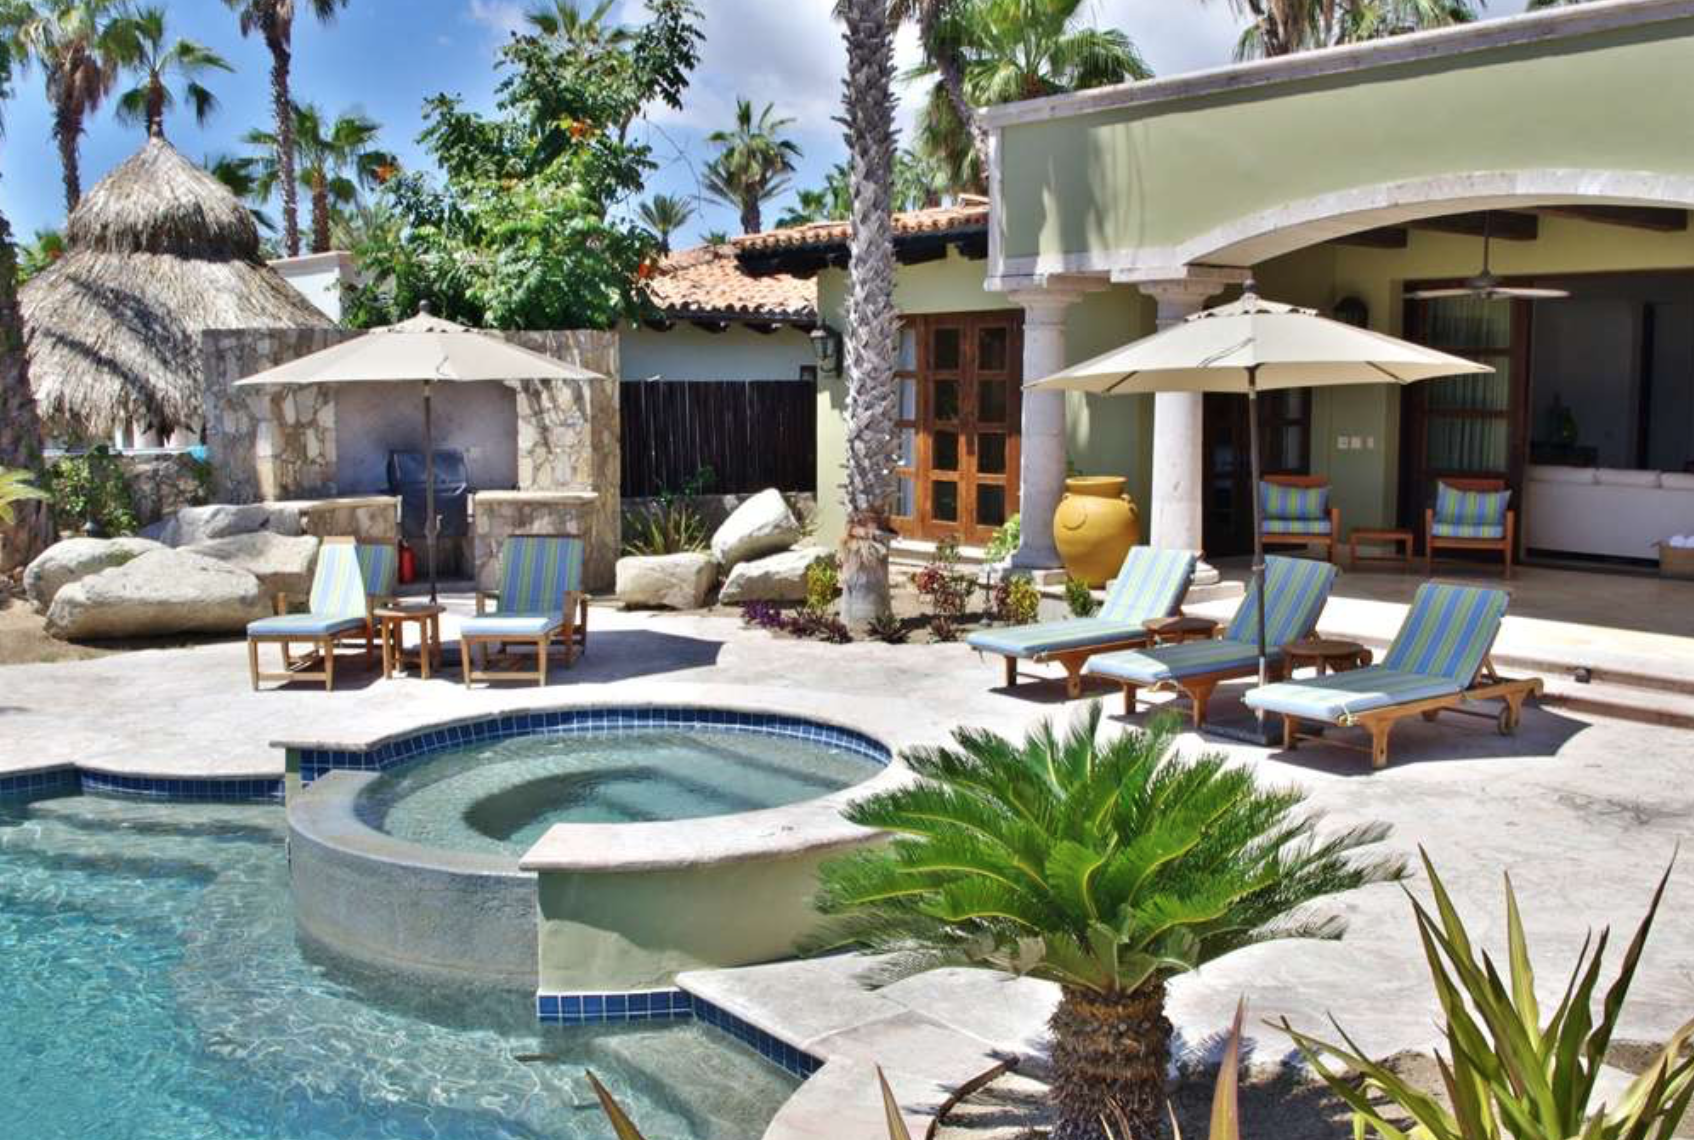 Relax At Casa Maravillas Vacation Rental in Cabo San Lucas Baja California Sur